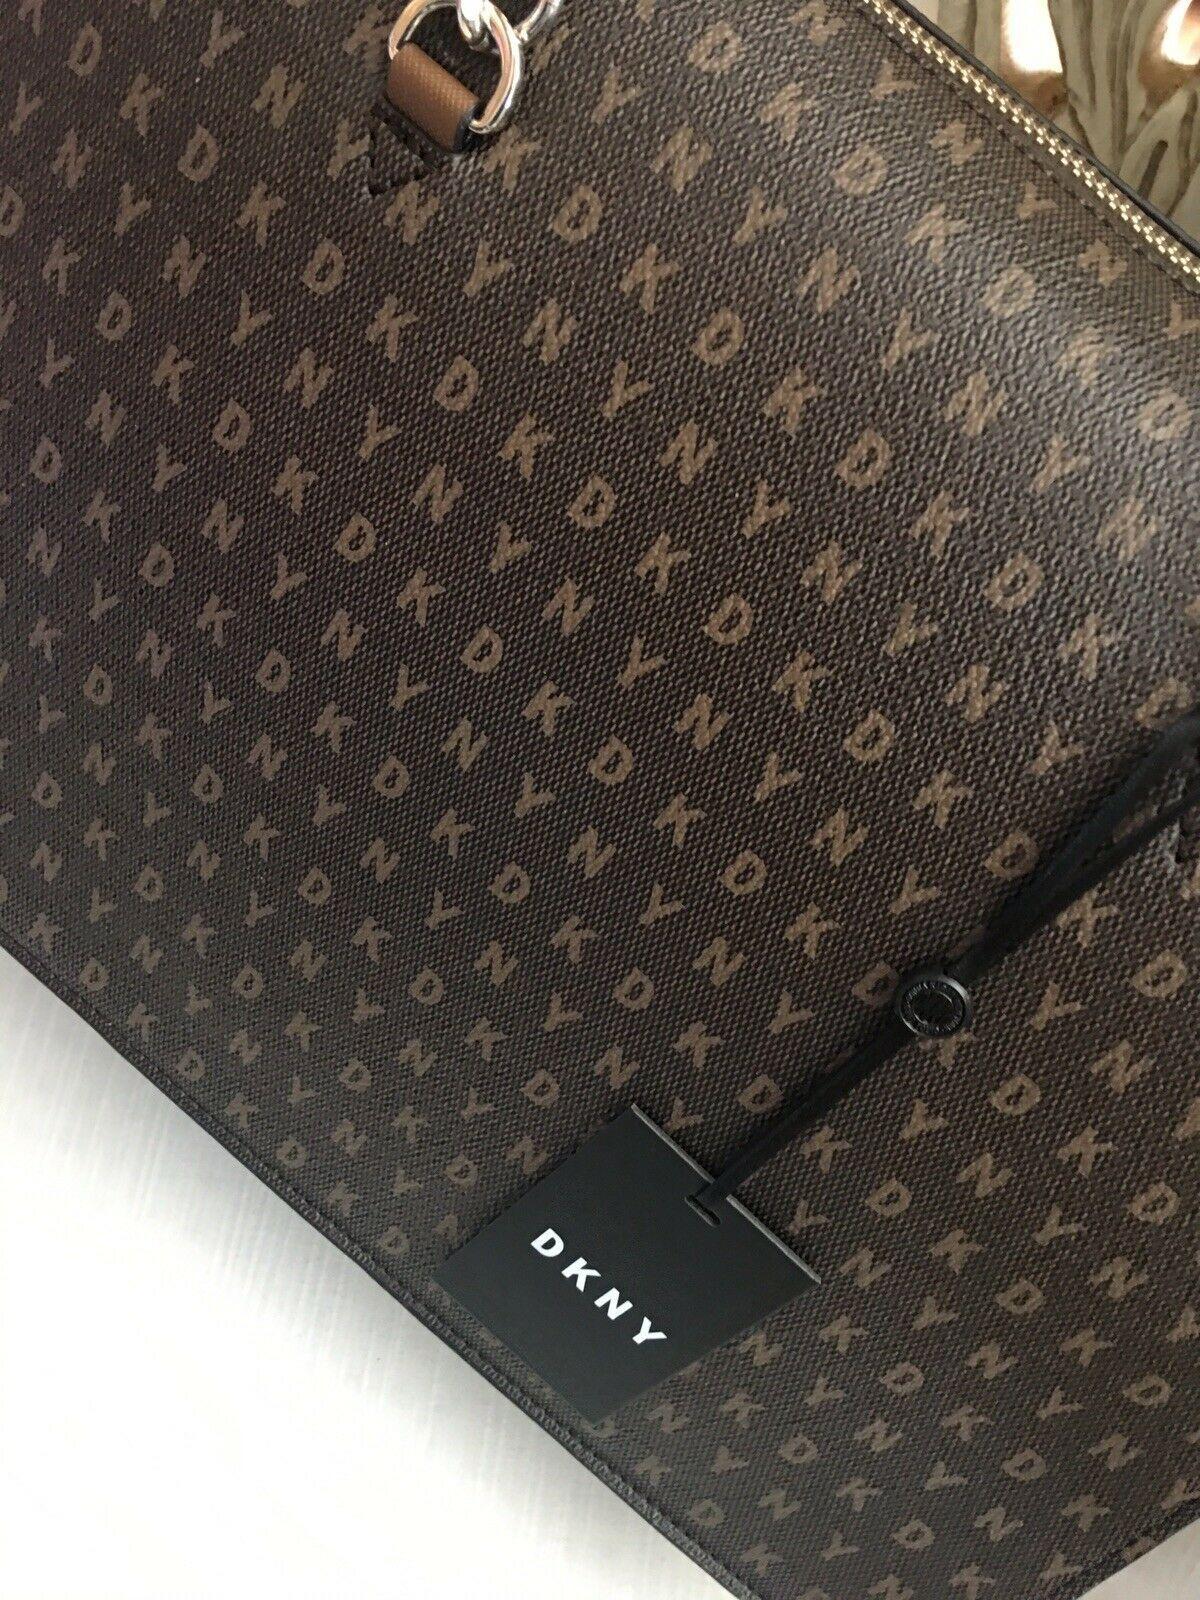 DKNY BRYANT Signature Logo TOP ZIP TOTE Handbag Brown R74A4009 $248 NEW